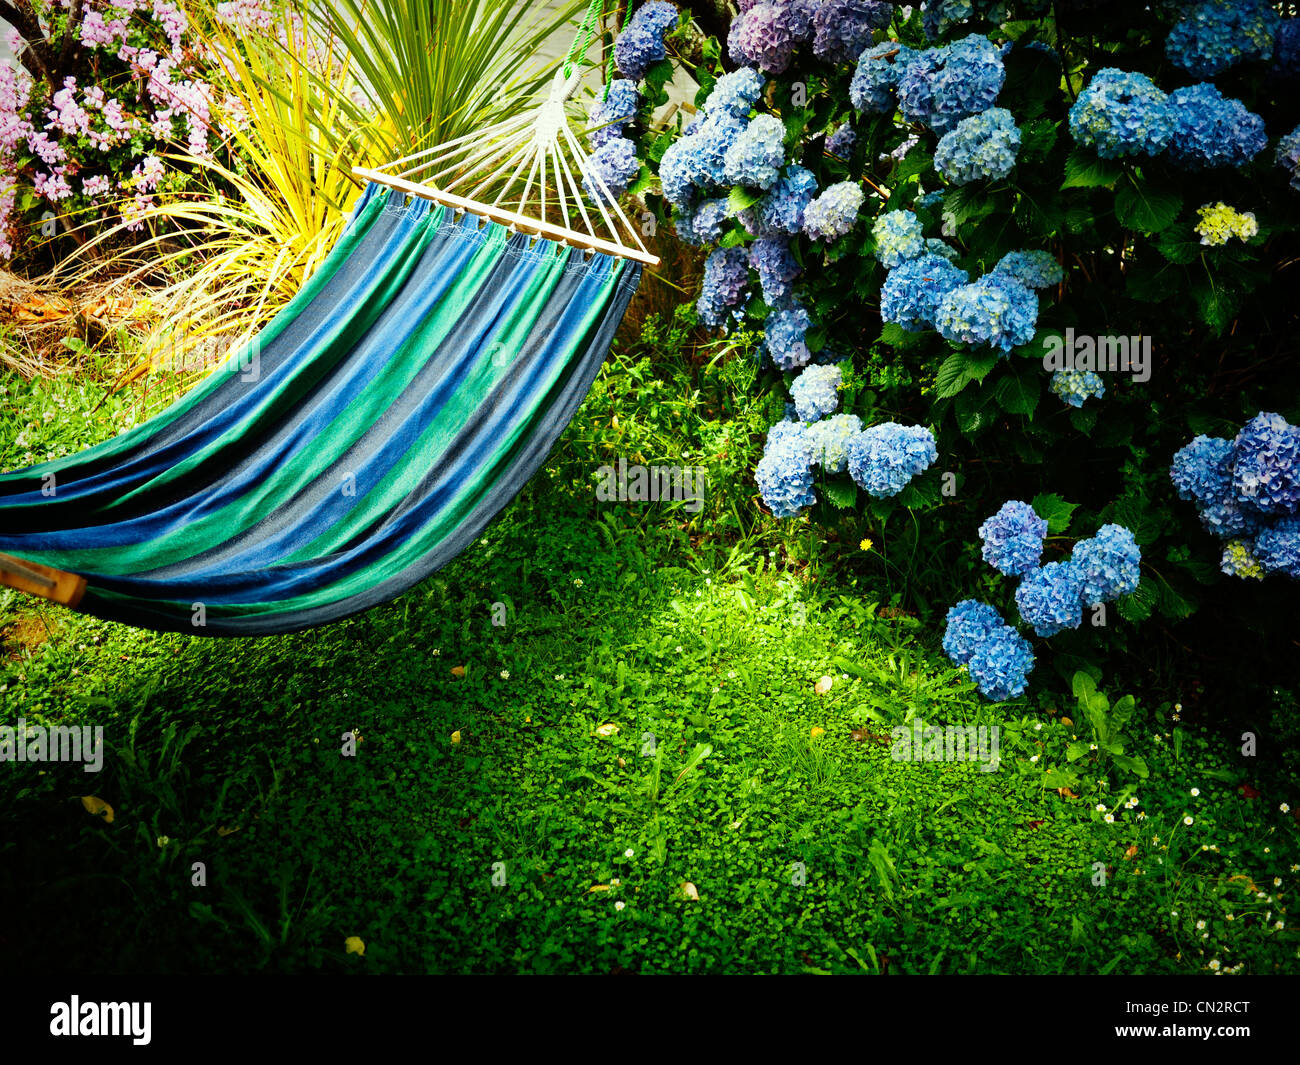 Summer in New Zealand: blue hammock, lawn and hydrangea. Stock Photo